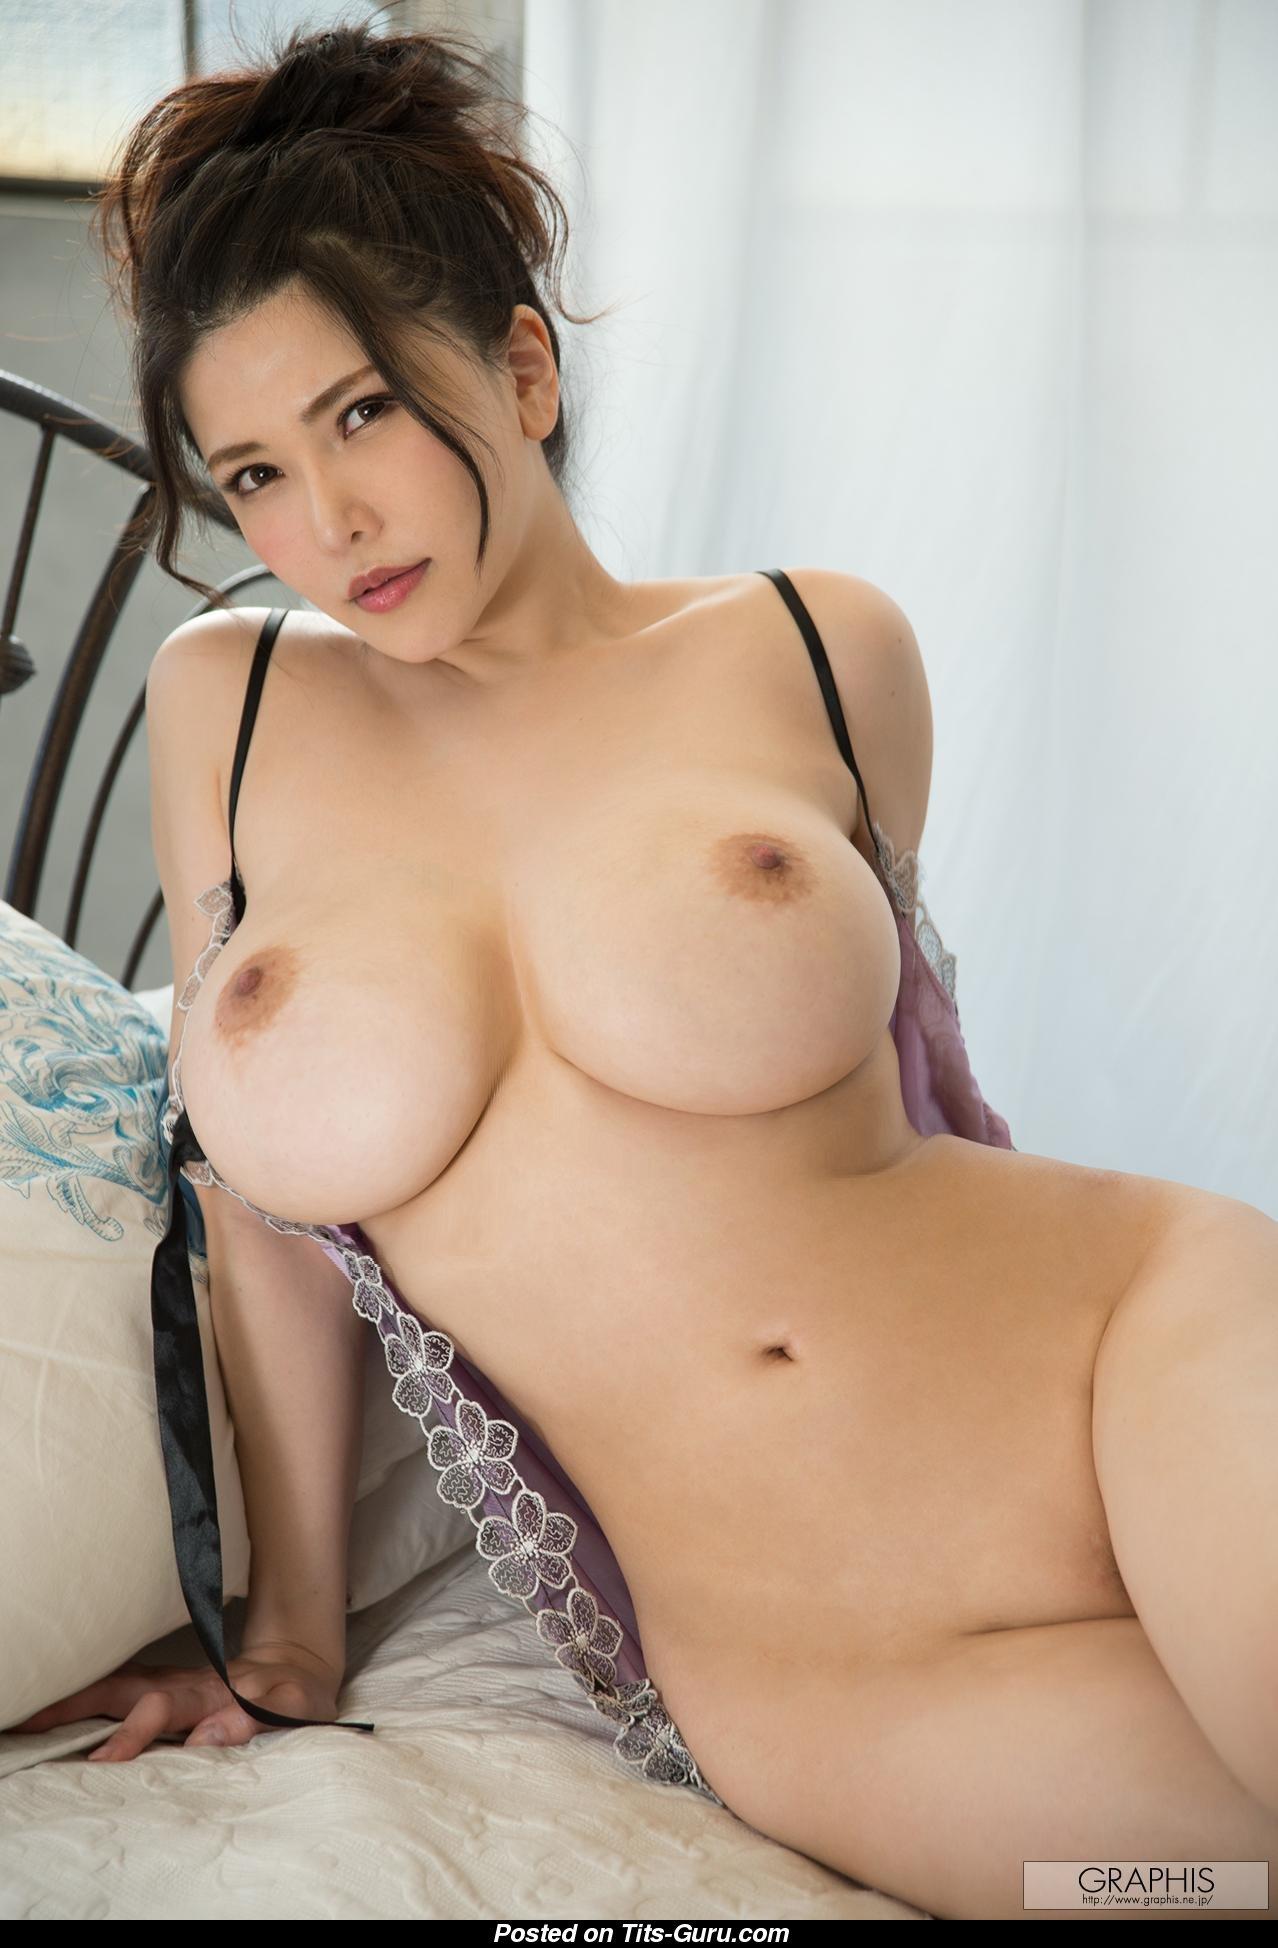 Nude women spreading pussy